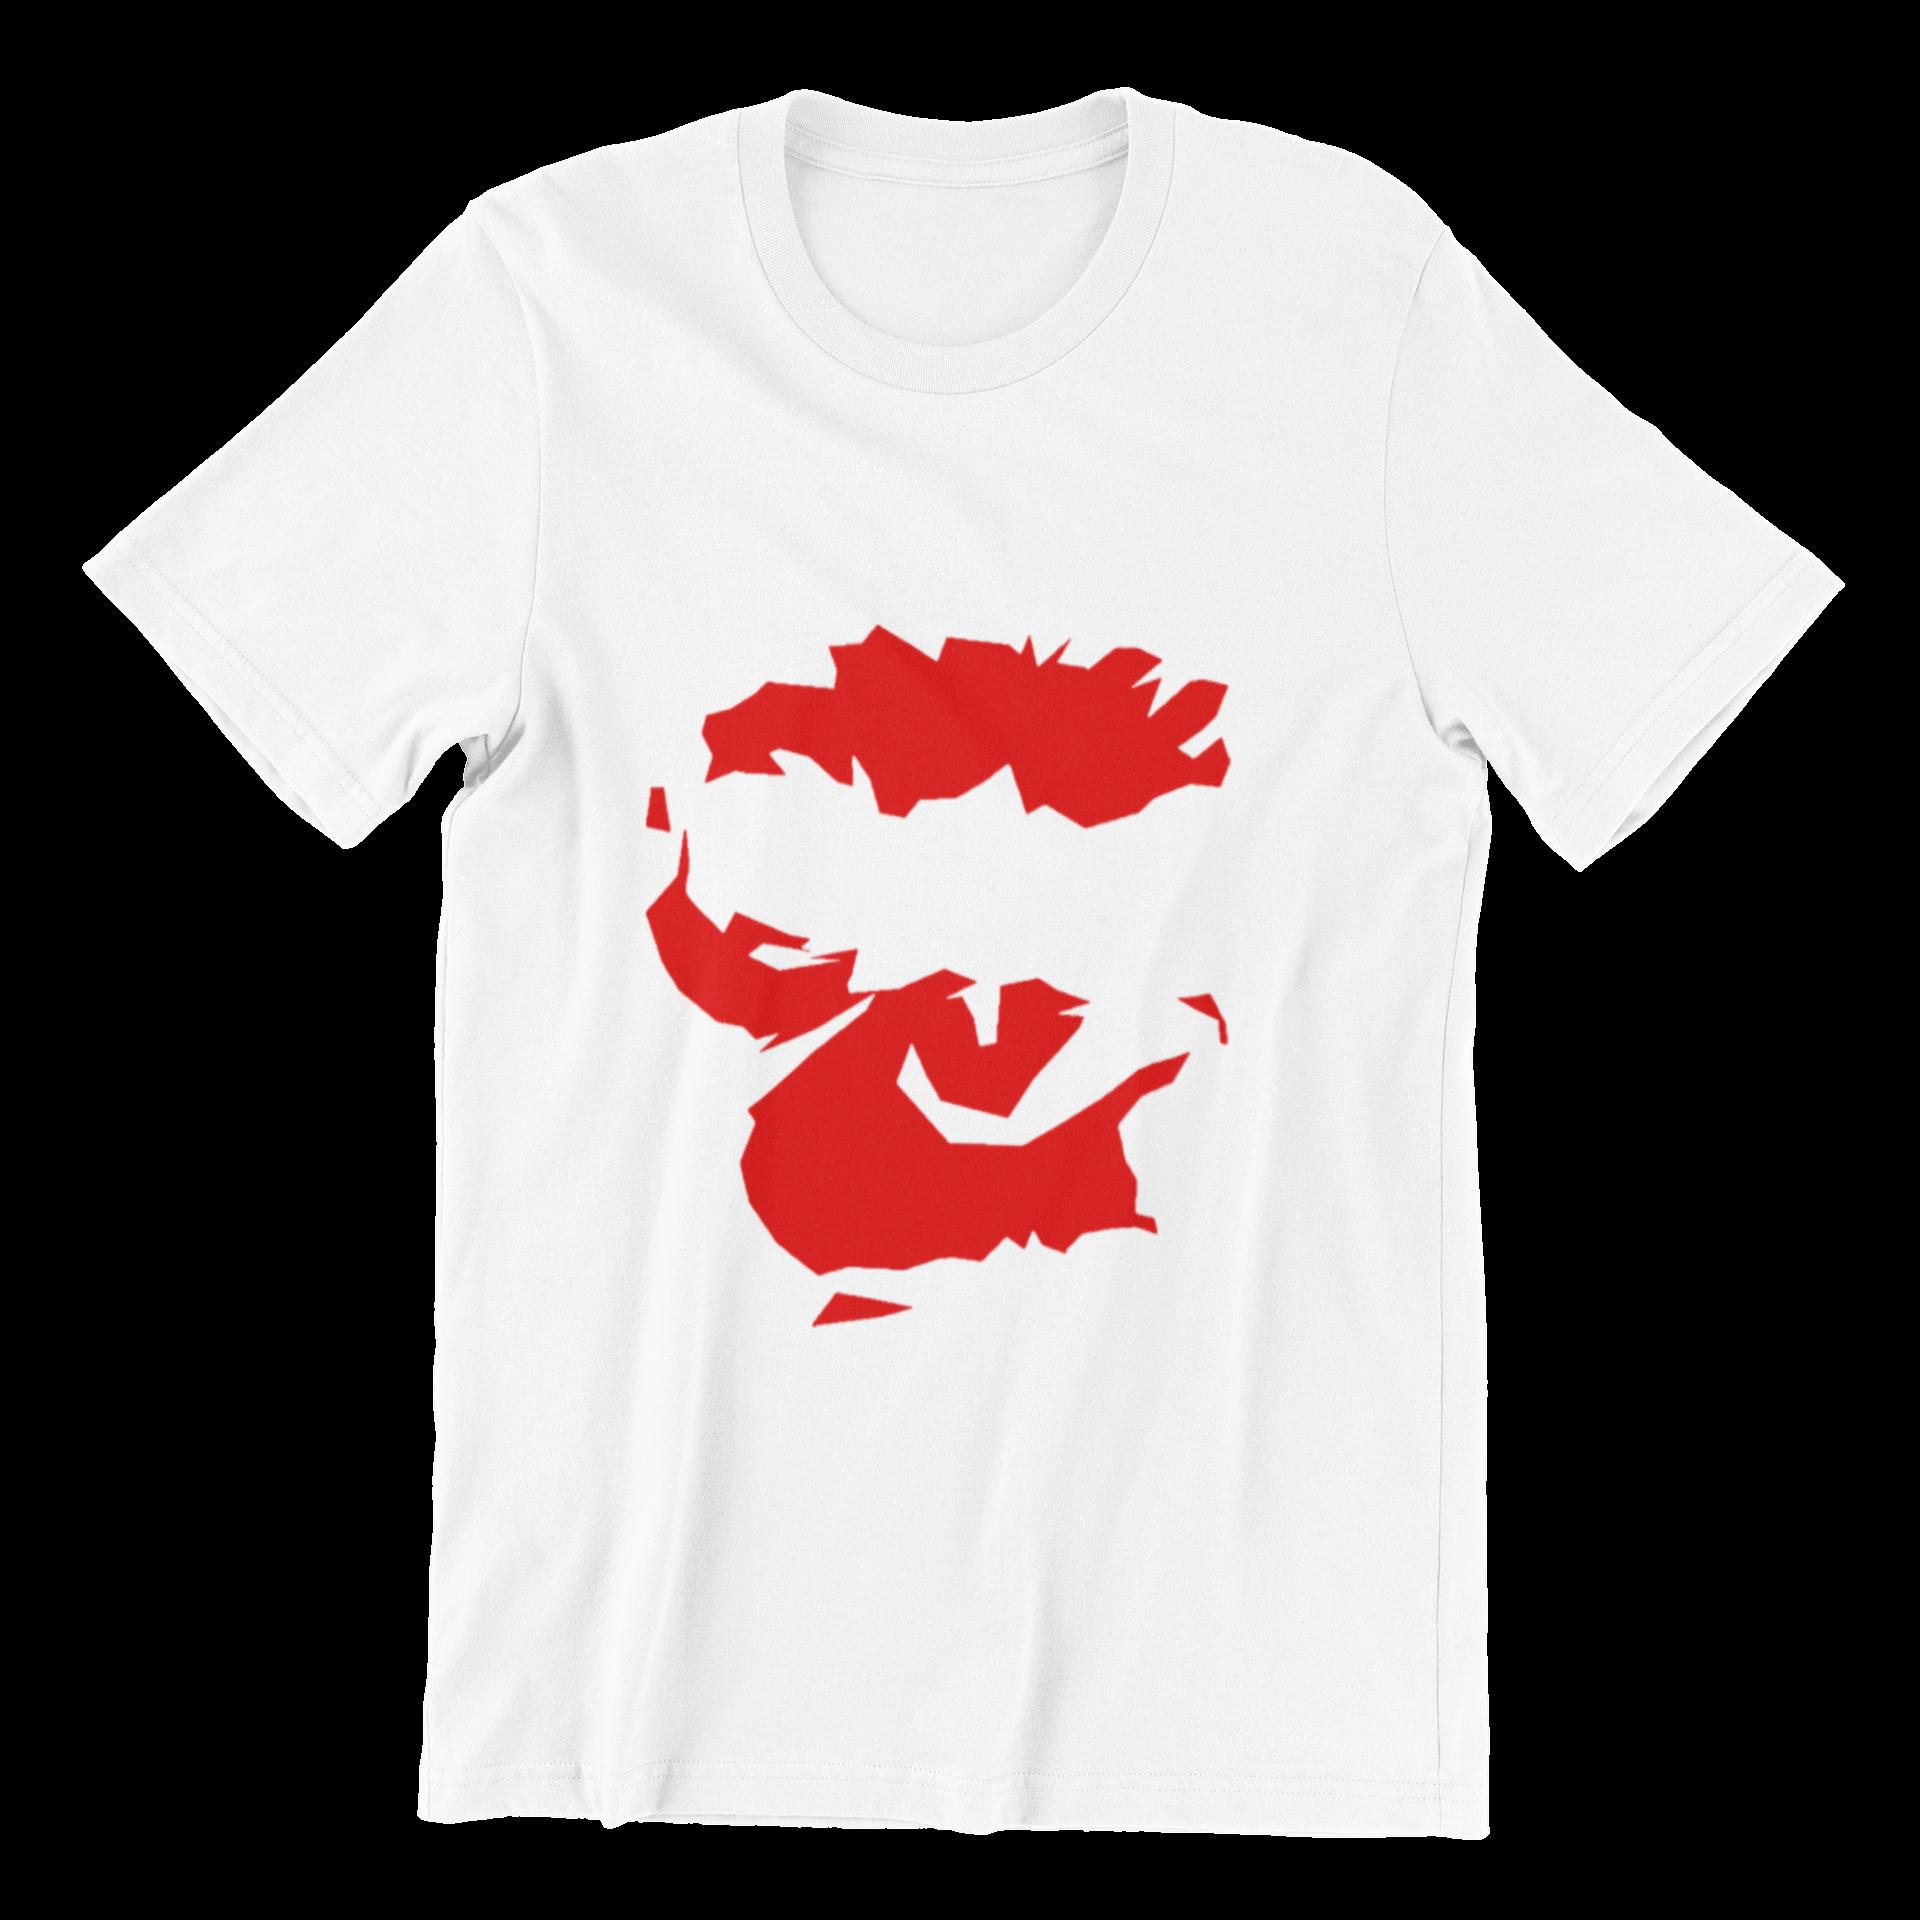 Lao Gao Monkey Crew Neck S-Sleeve T-shirt